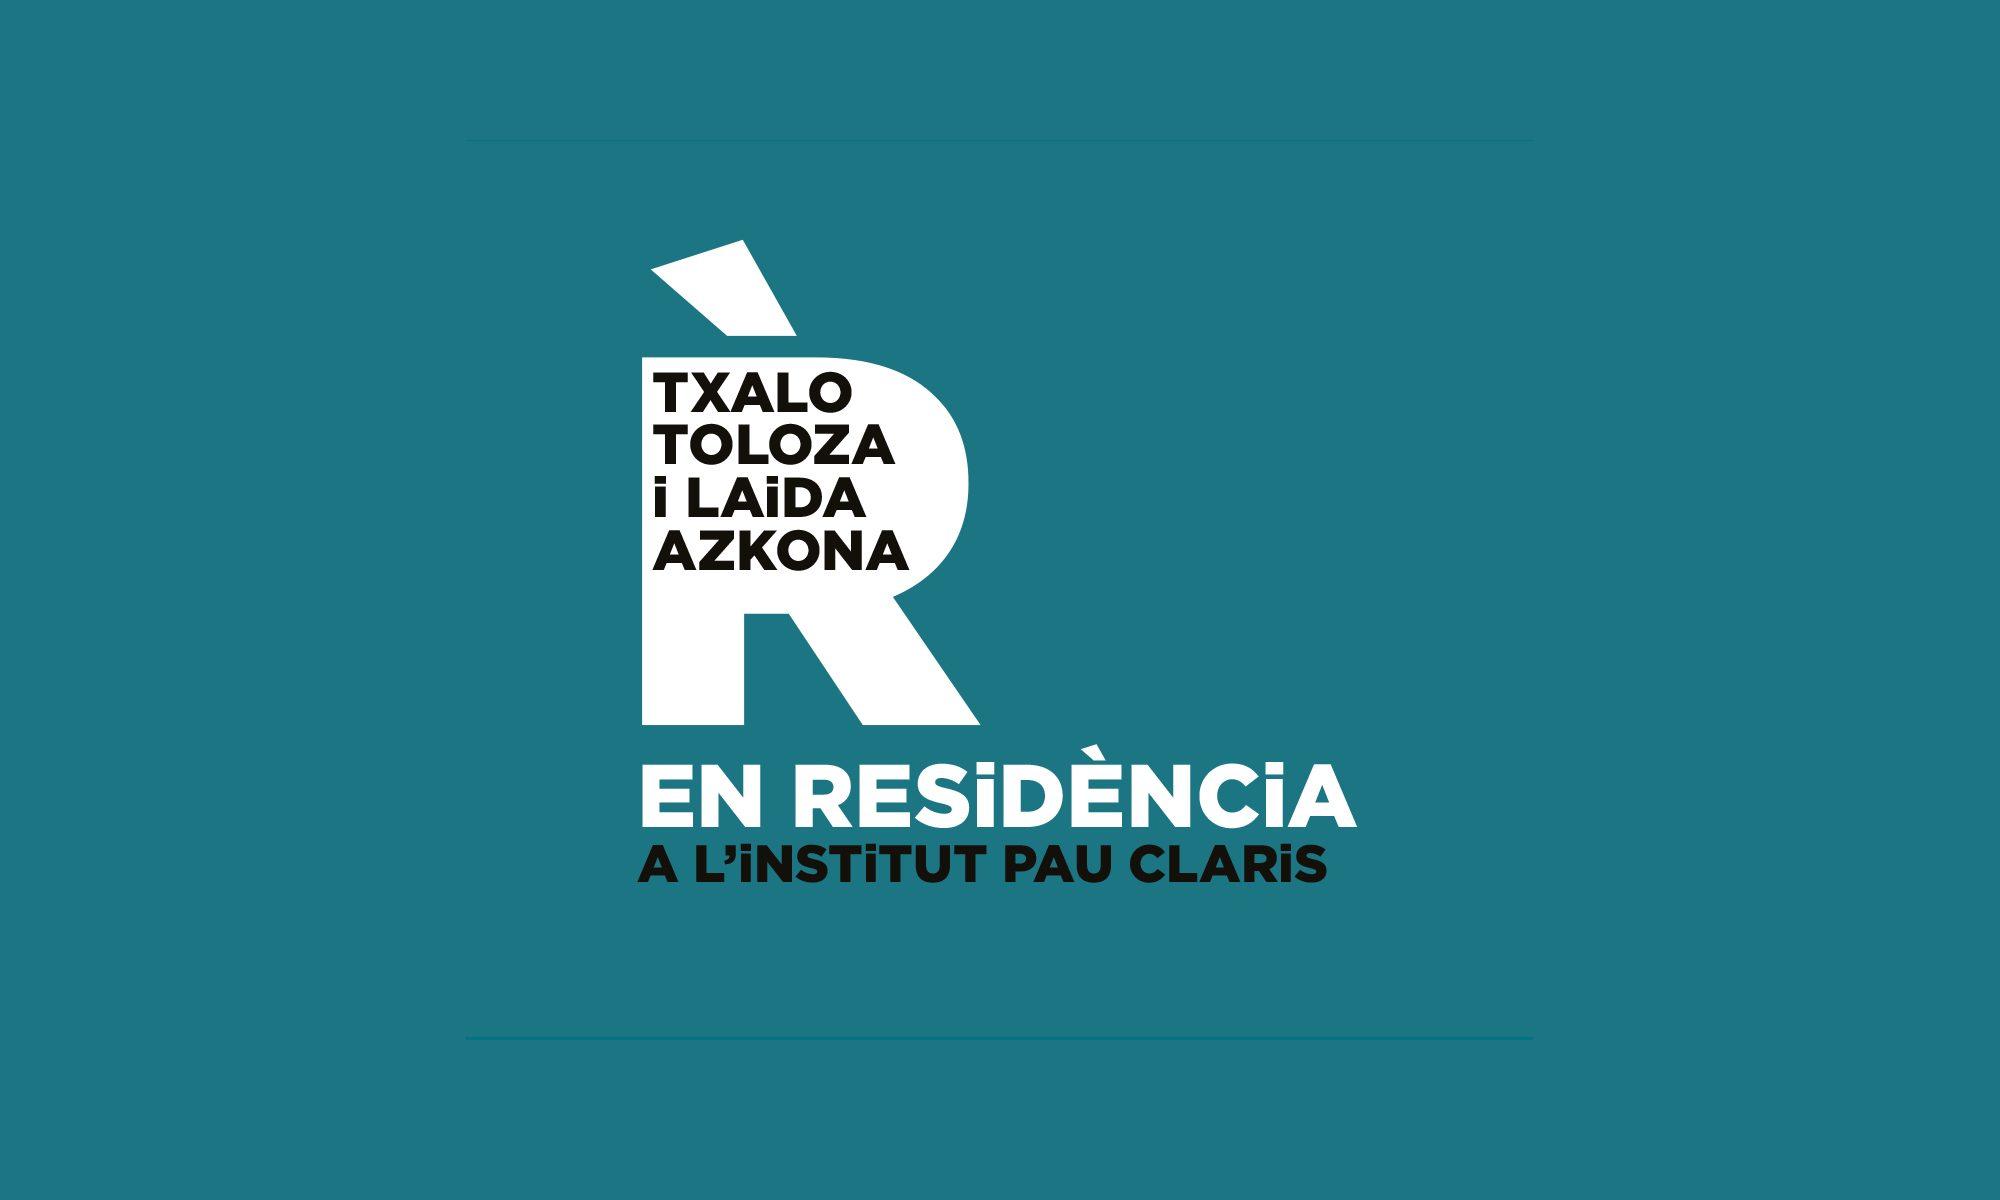 Txalo Toloza i Laida Azkona EN RESiDÈNCiA